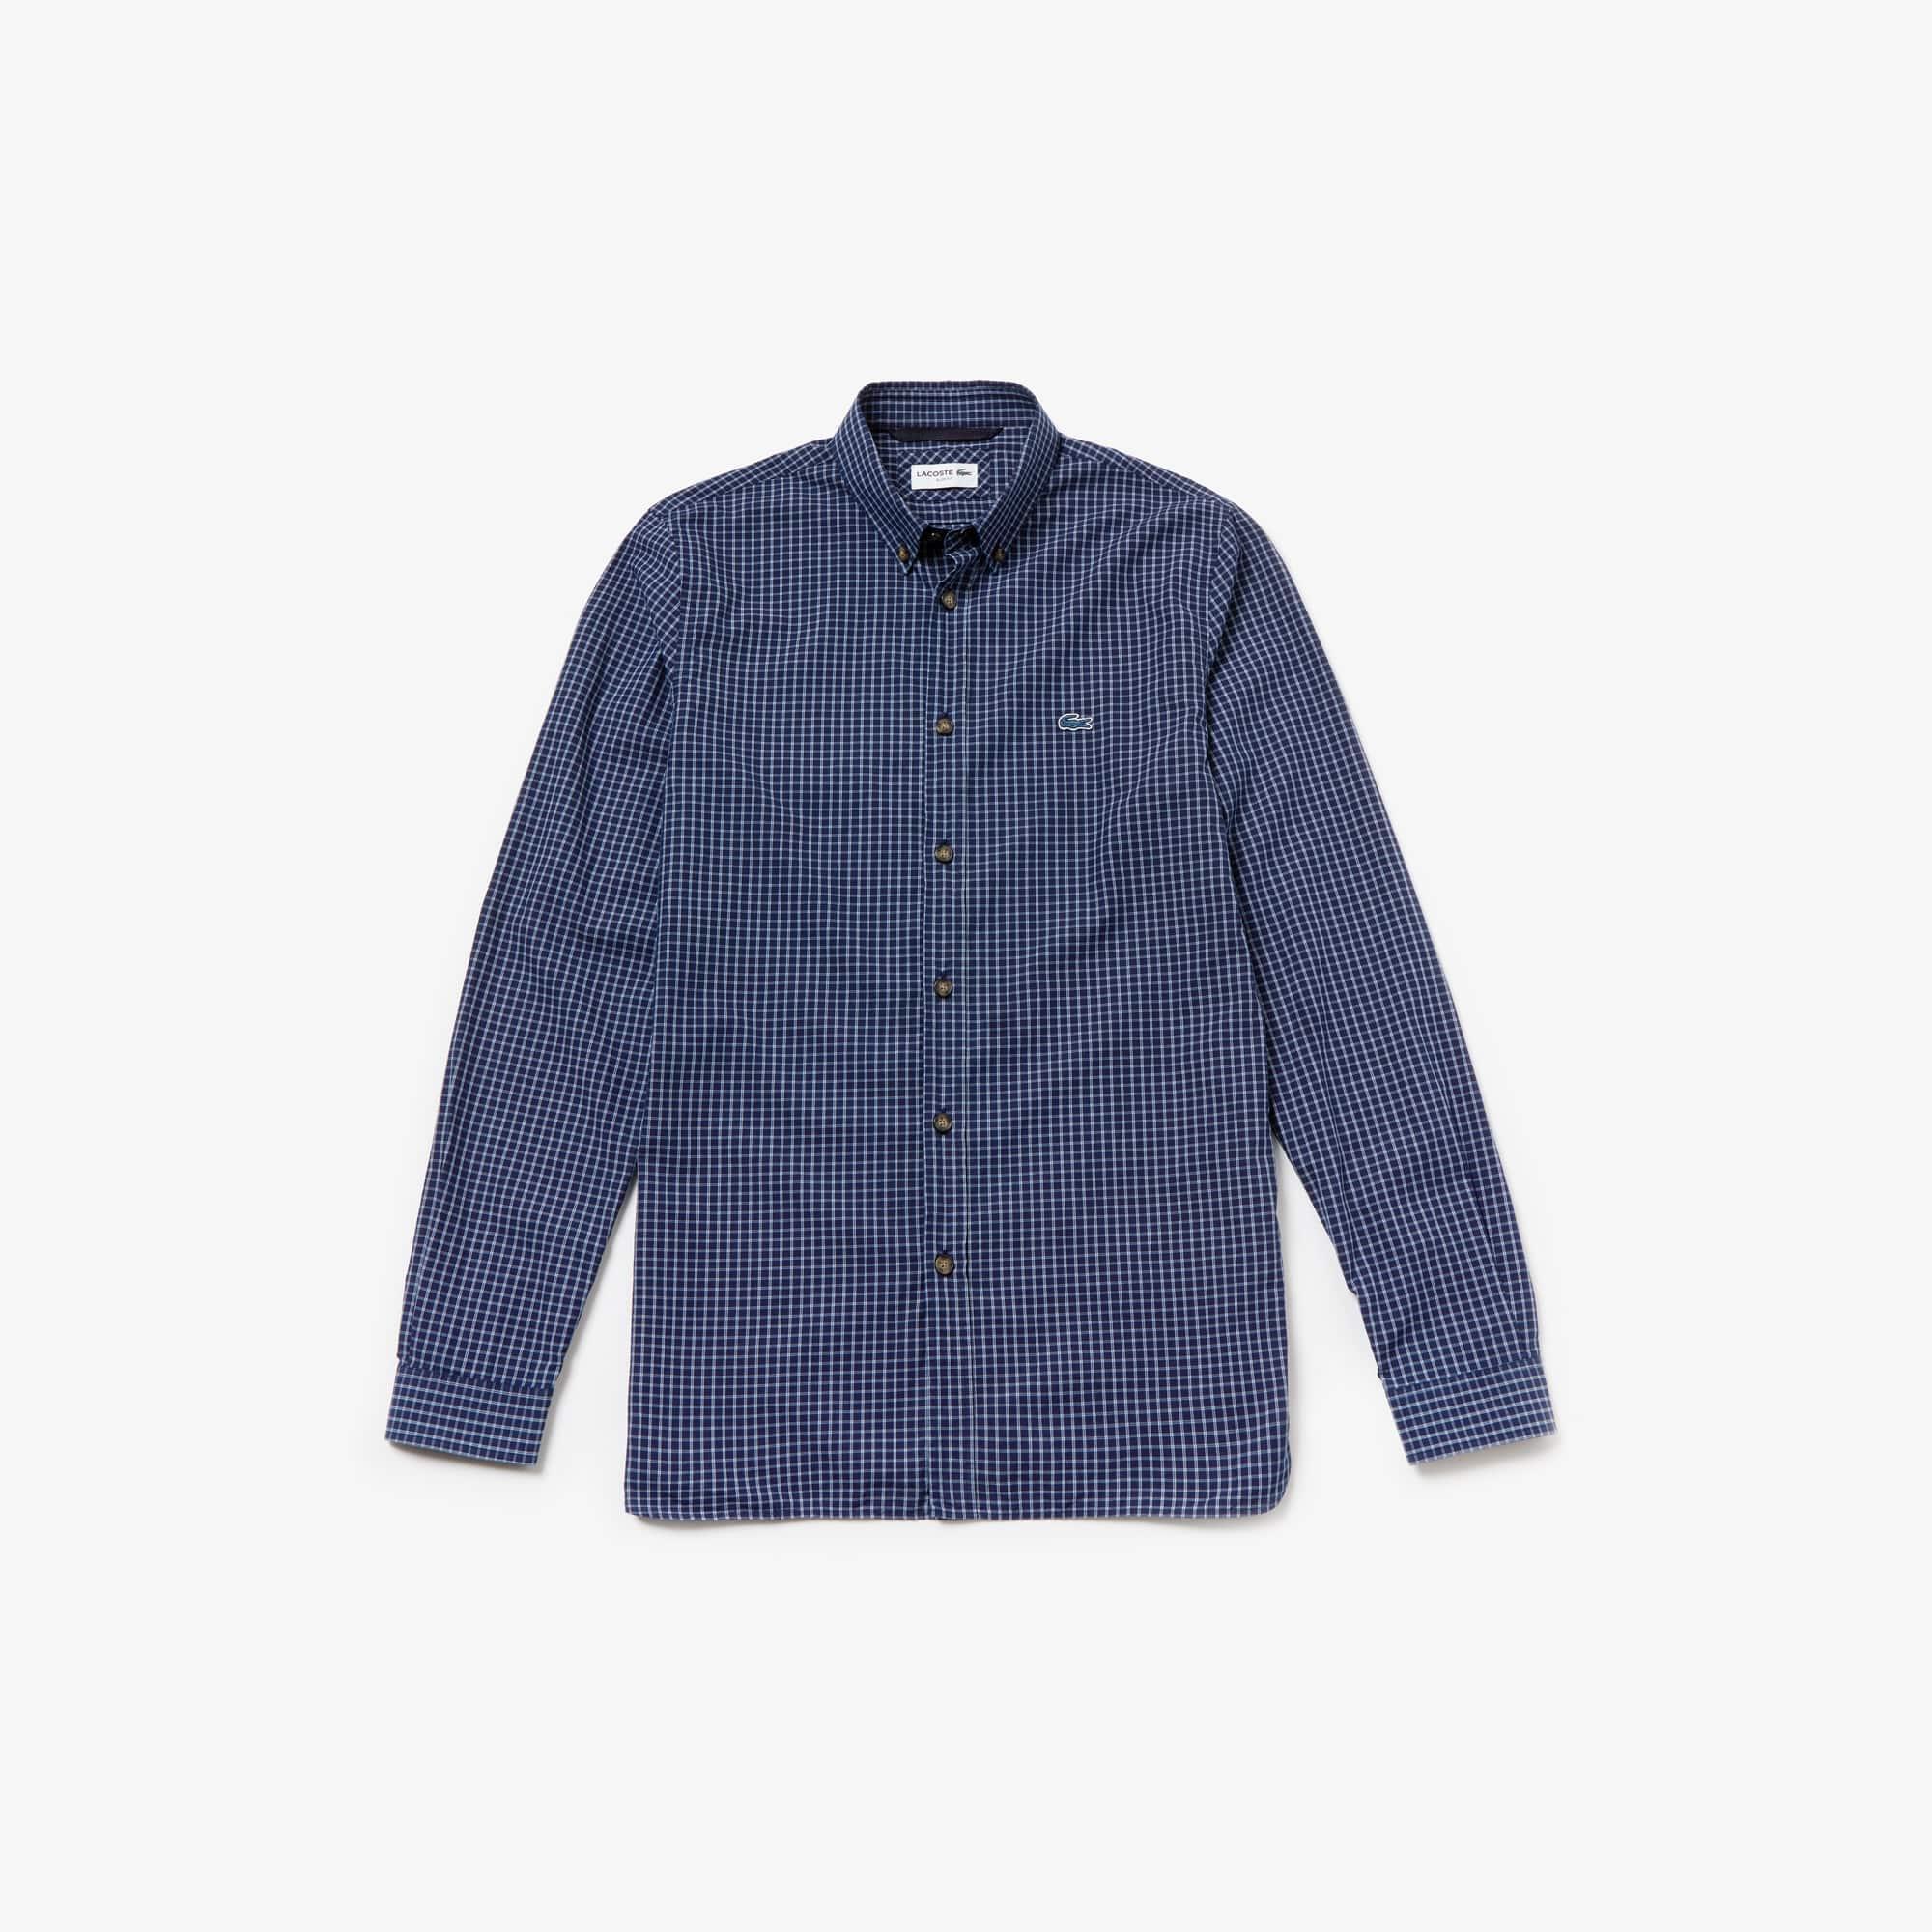 53b6acc82a Men's Slim Fit Check Cotton Poplin Shirt